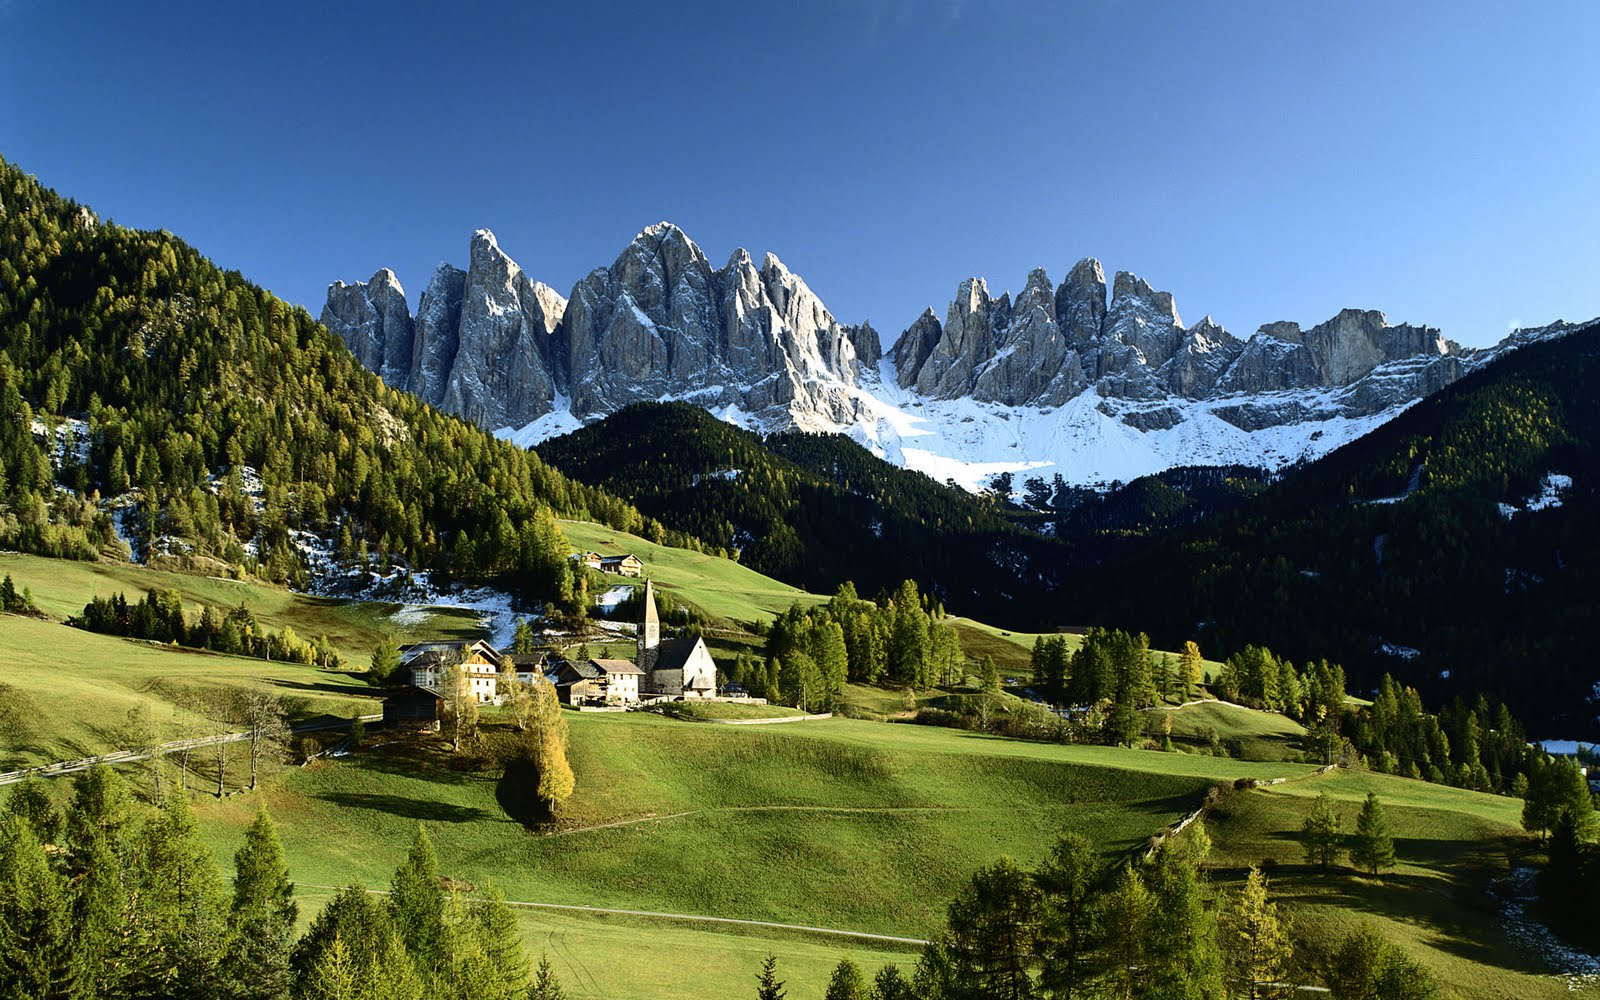 Veduta delle Dolomiti, Funes ? Villnoss, Bolzano (Dolomites and Green Villnoss Valley)